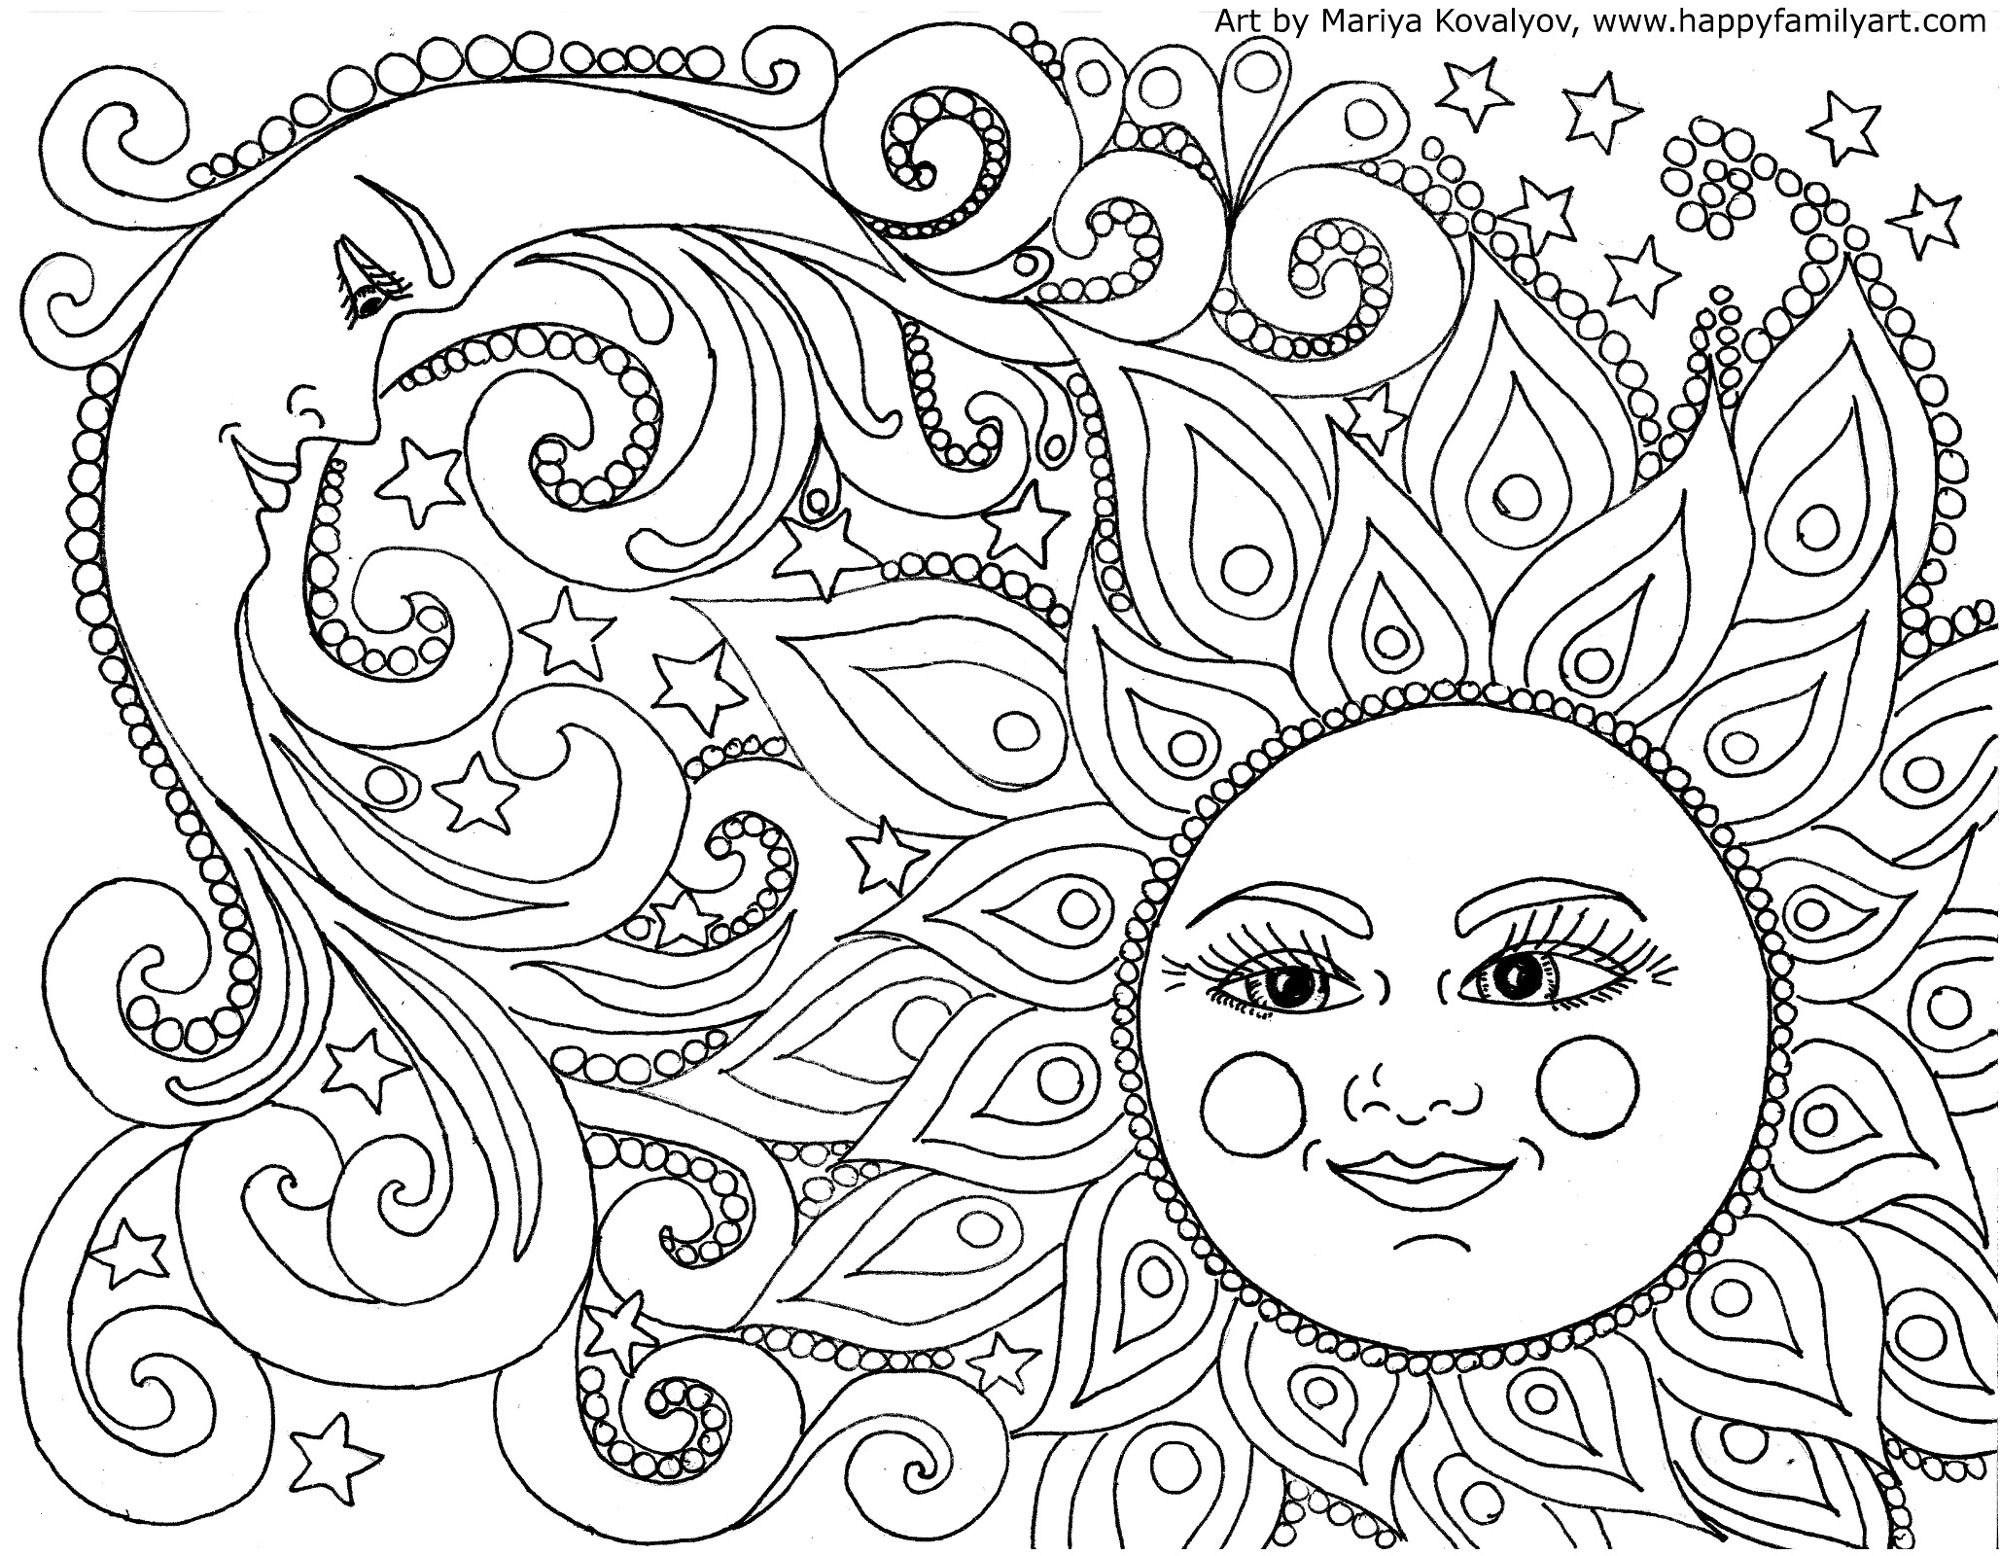 Mandalas For Kids - Fresh Free Printable Mandala Coloring Pages - Mandala Coloring Free Printable